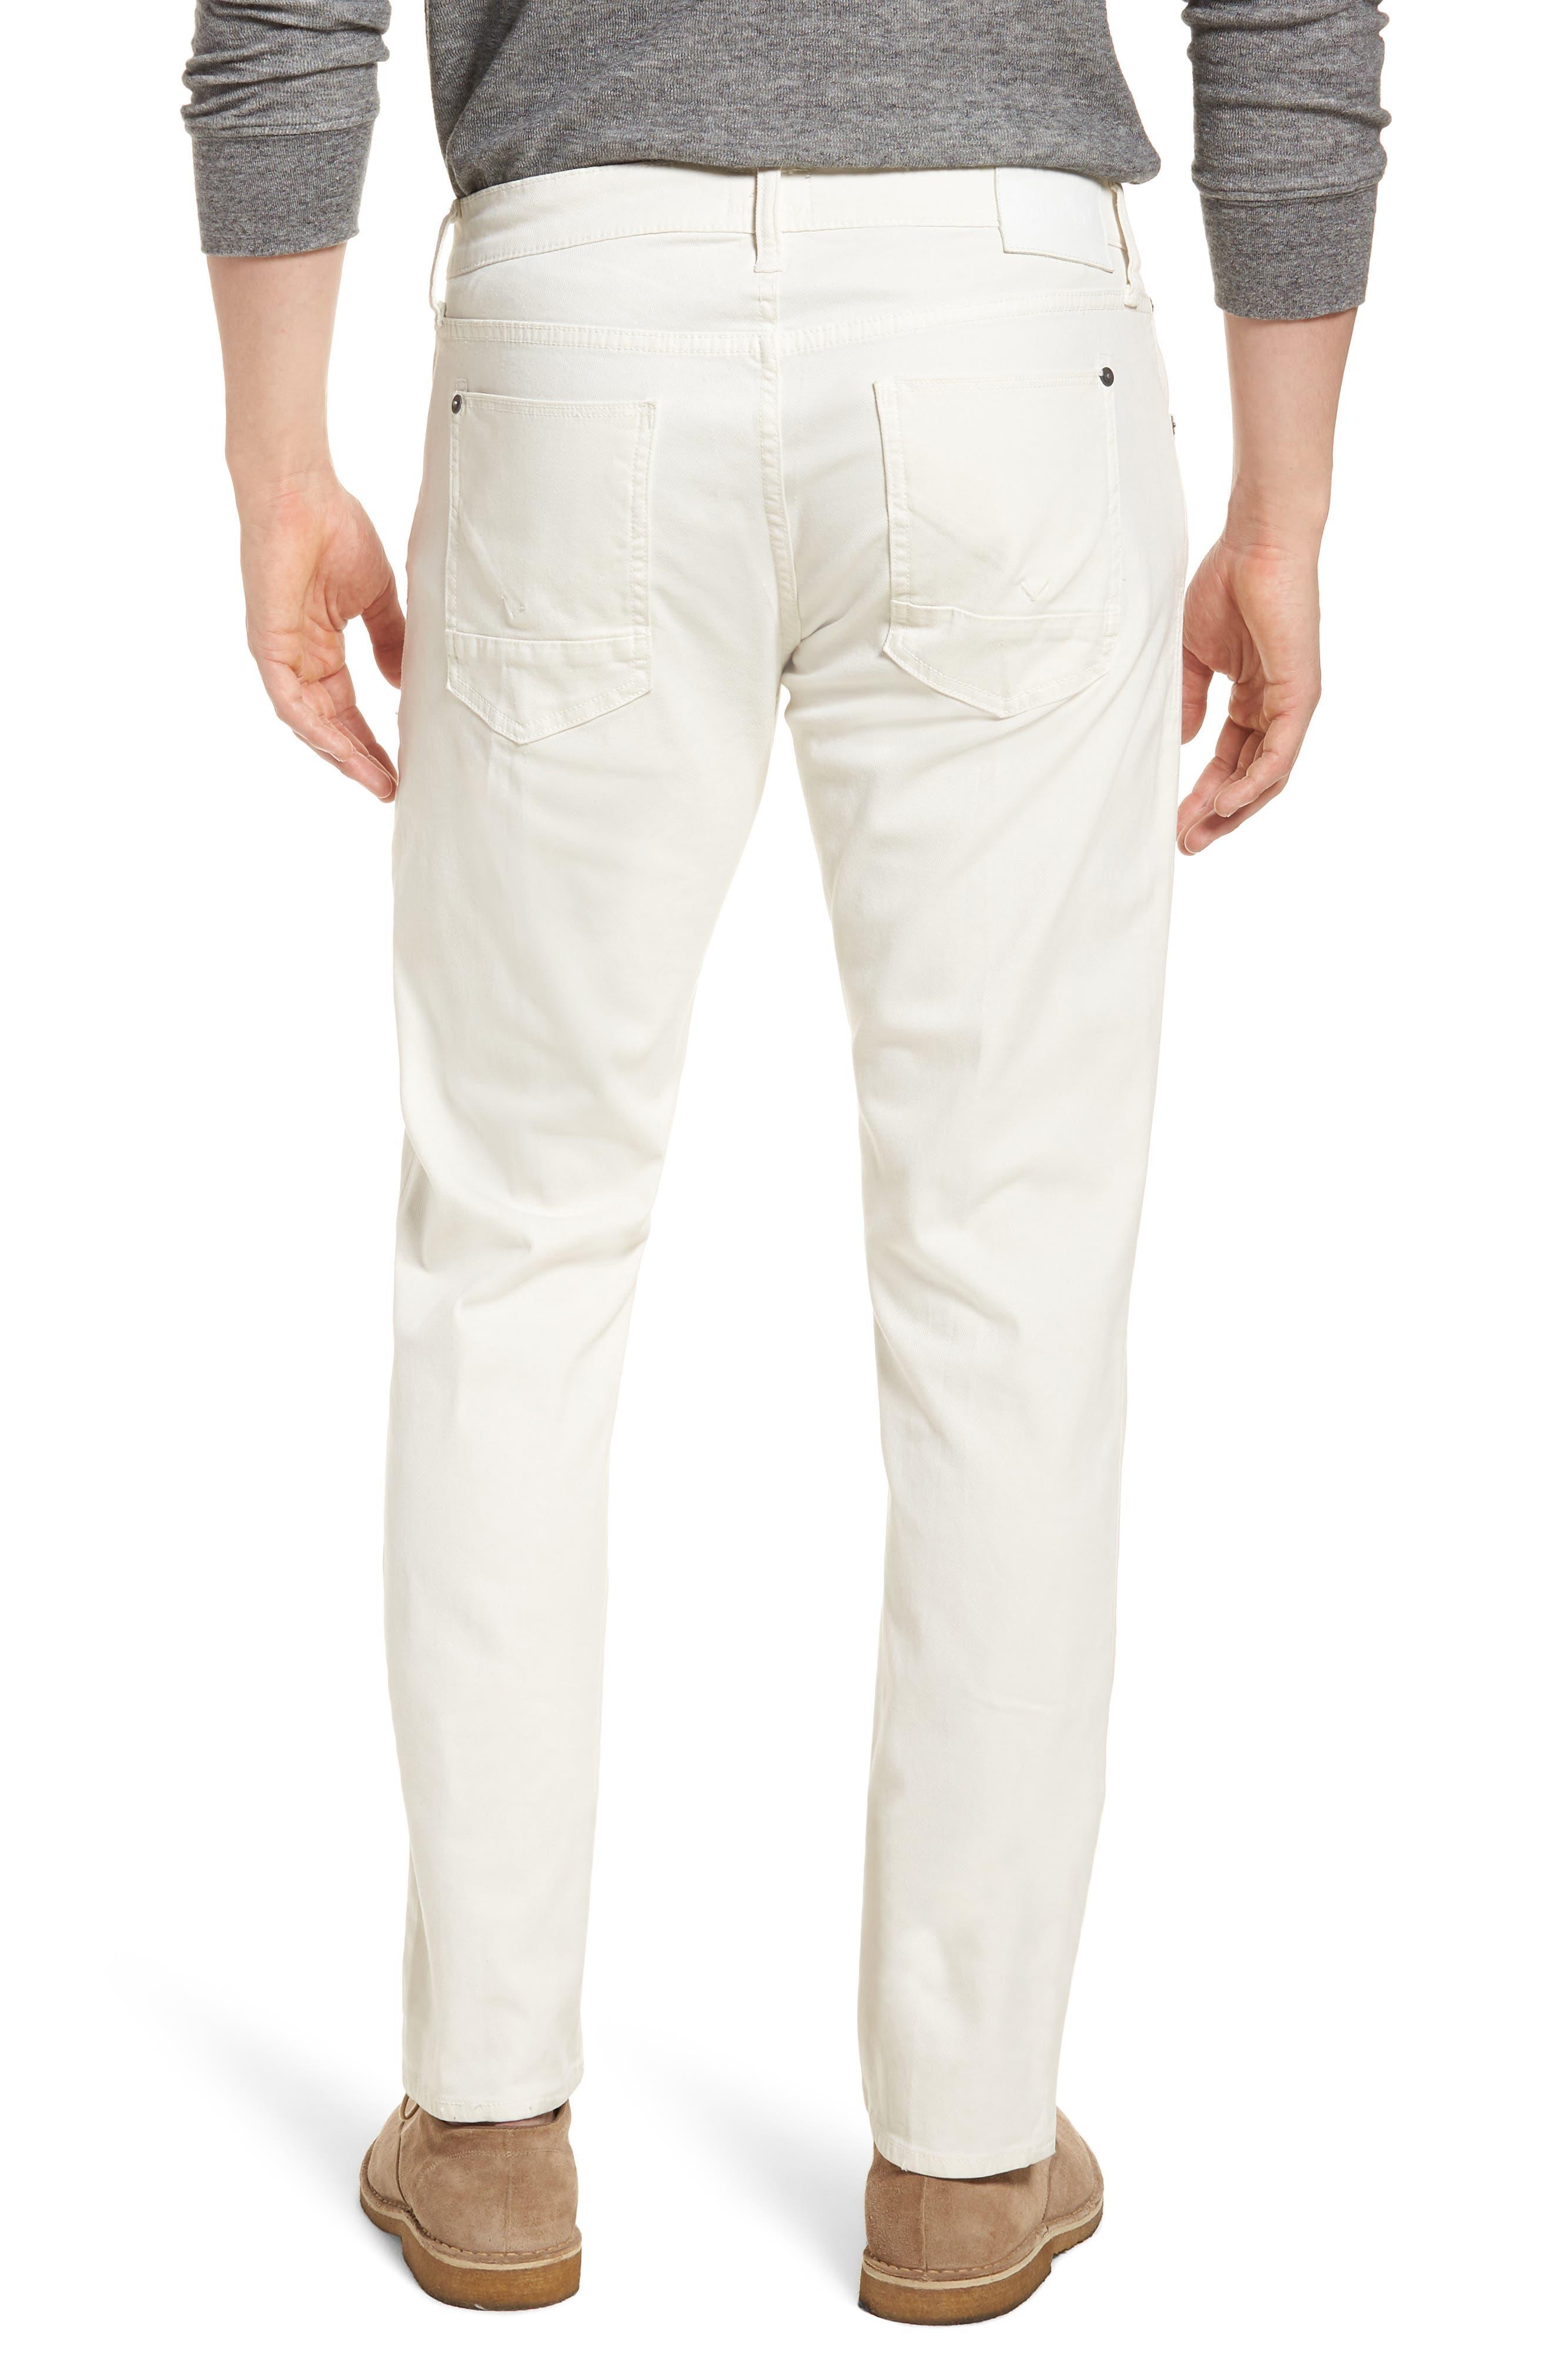 Blake Slim Fit Jeans,                             Alternate thumbnail 3, color,                             Off White